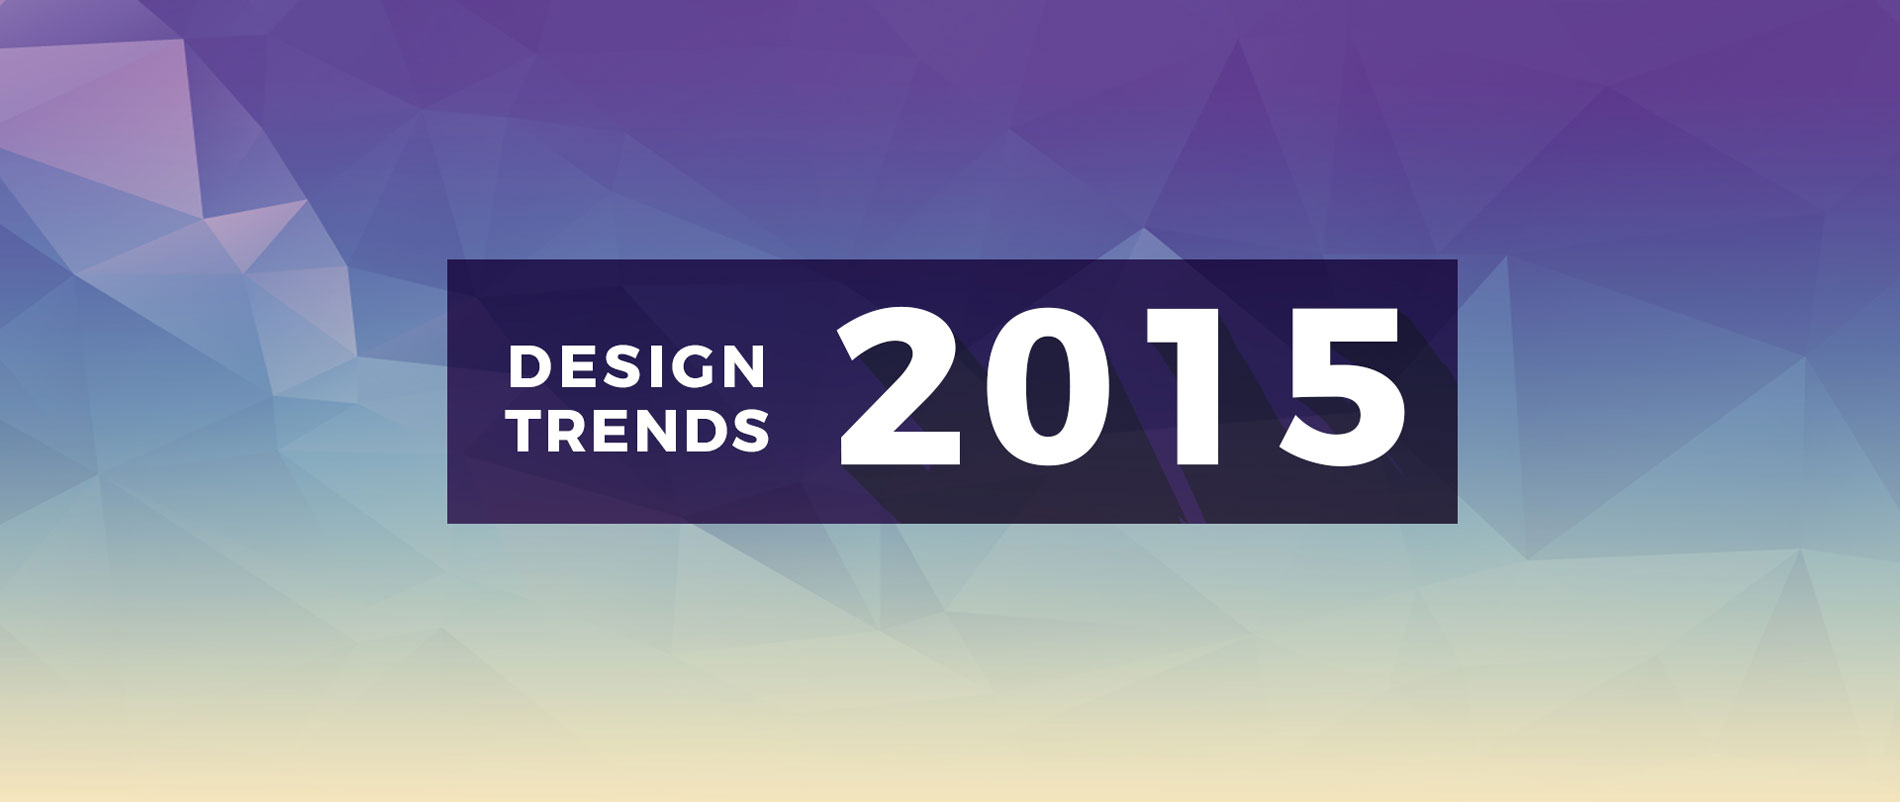 2015 designtrends